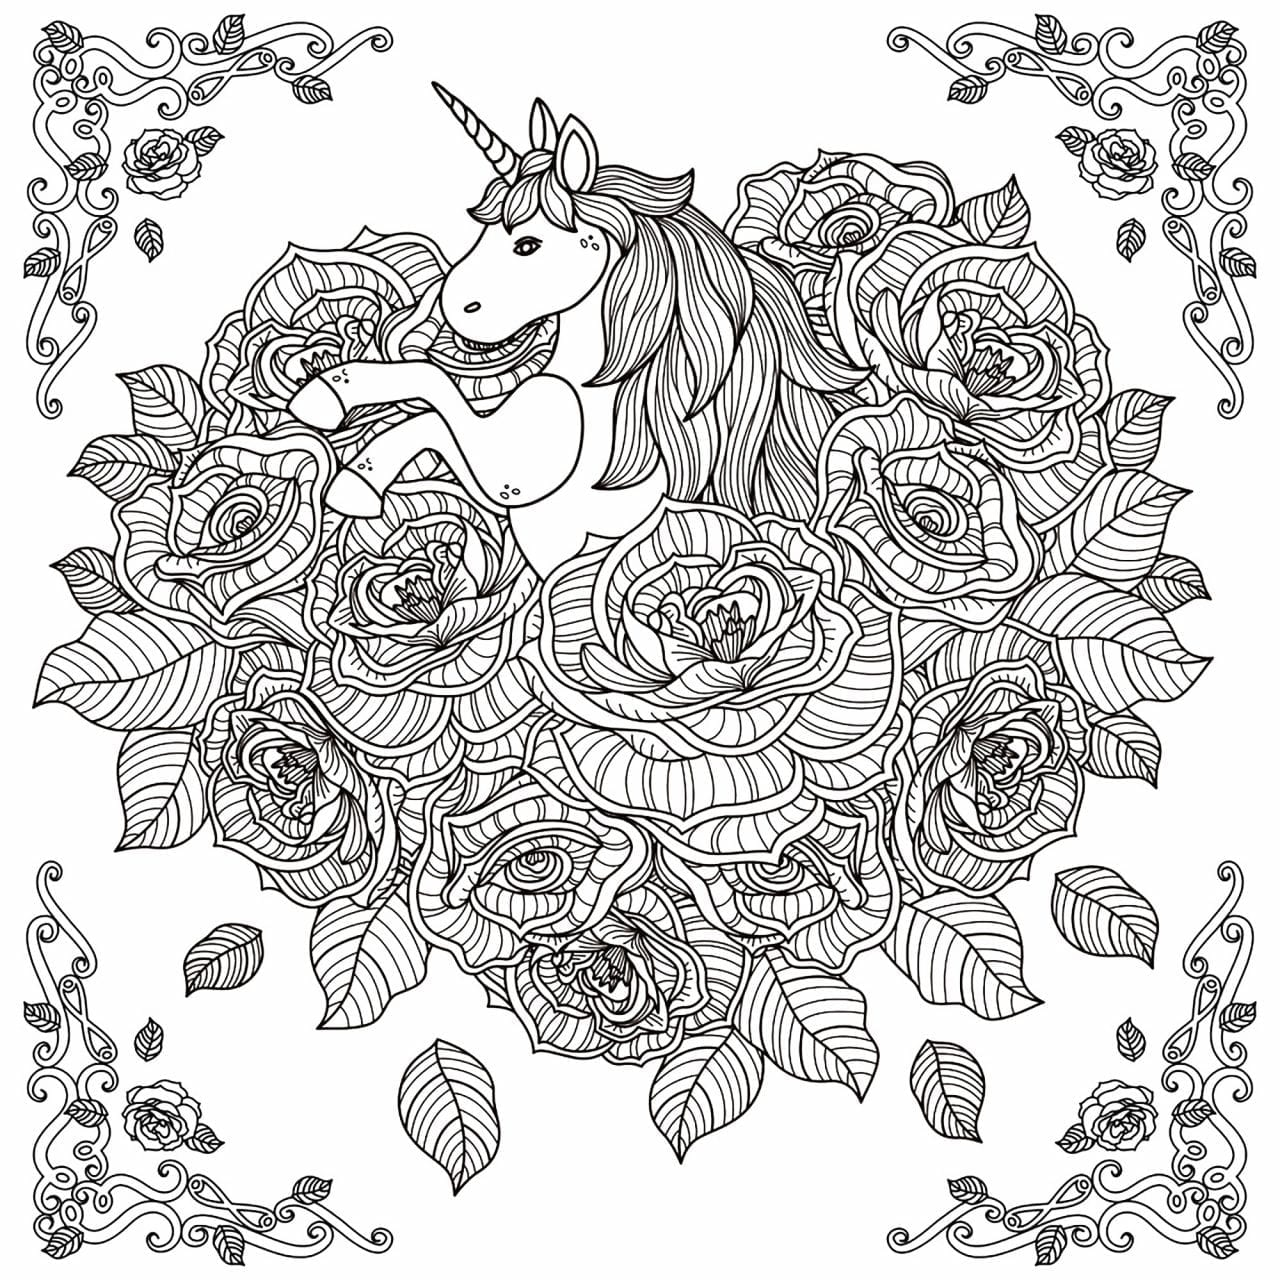 unicornio dificil para colorir criando com apego